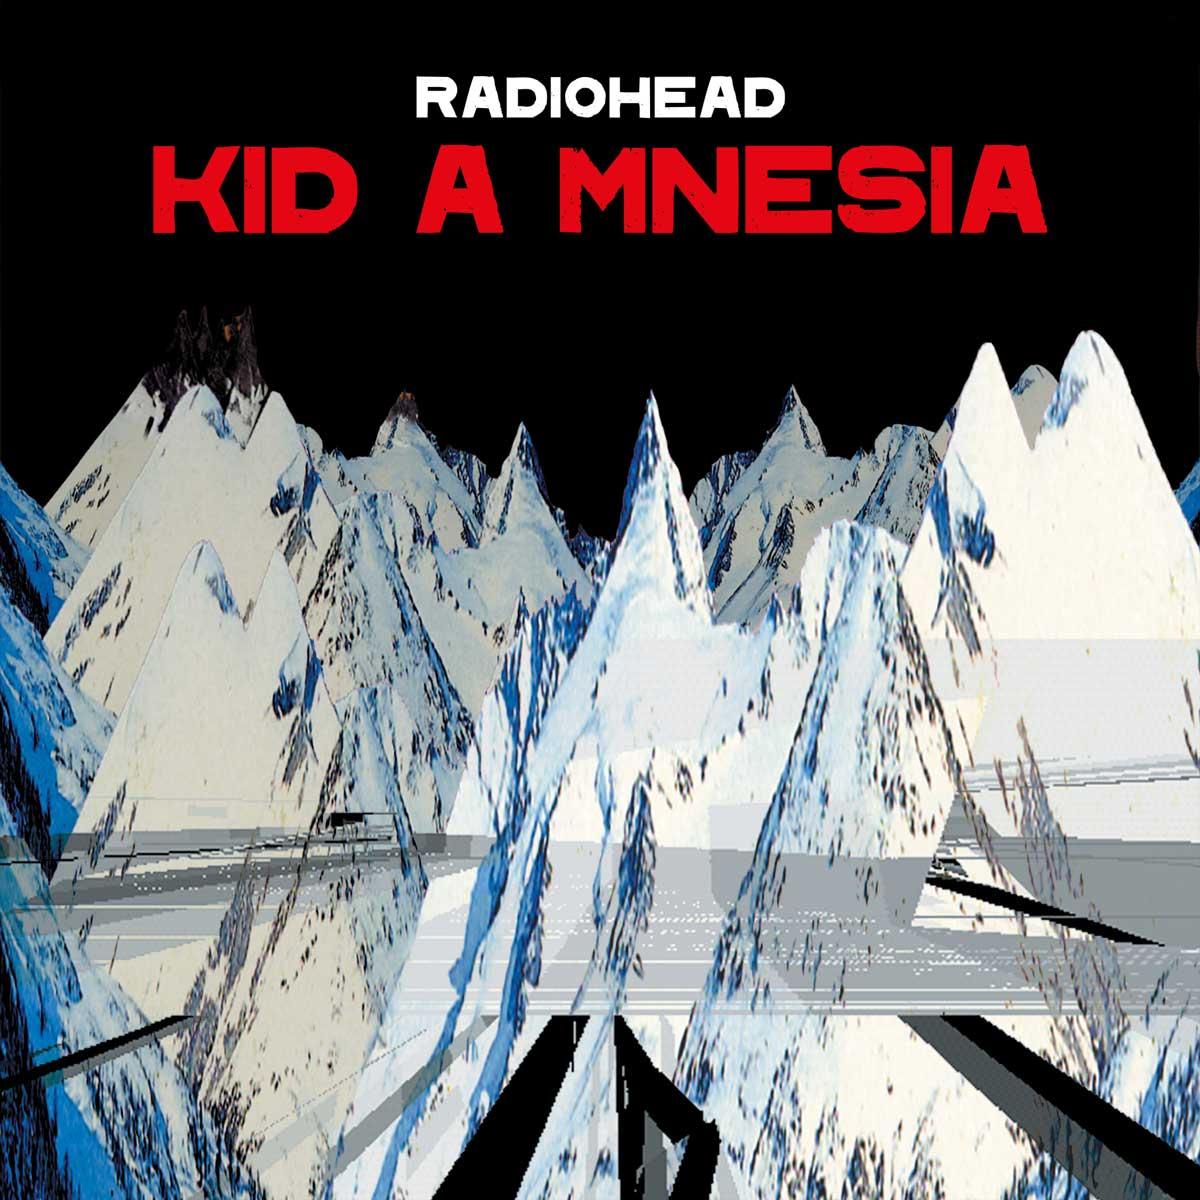 Radionhead KID A MNESIA album cover